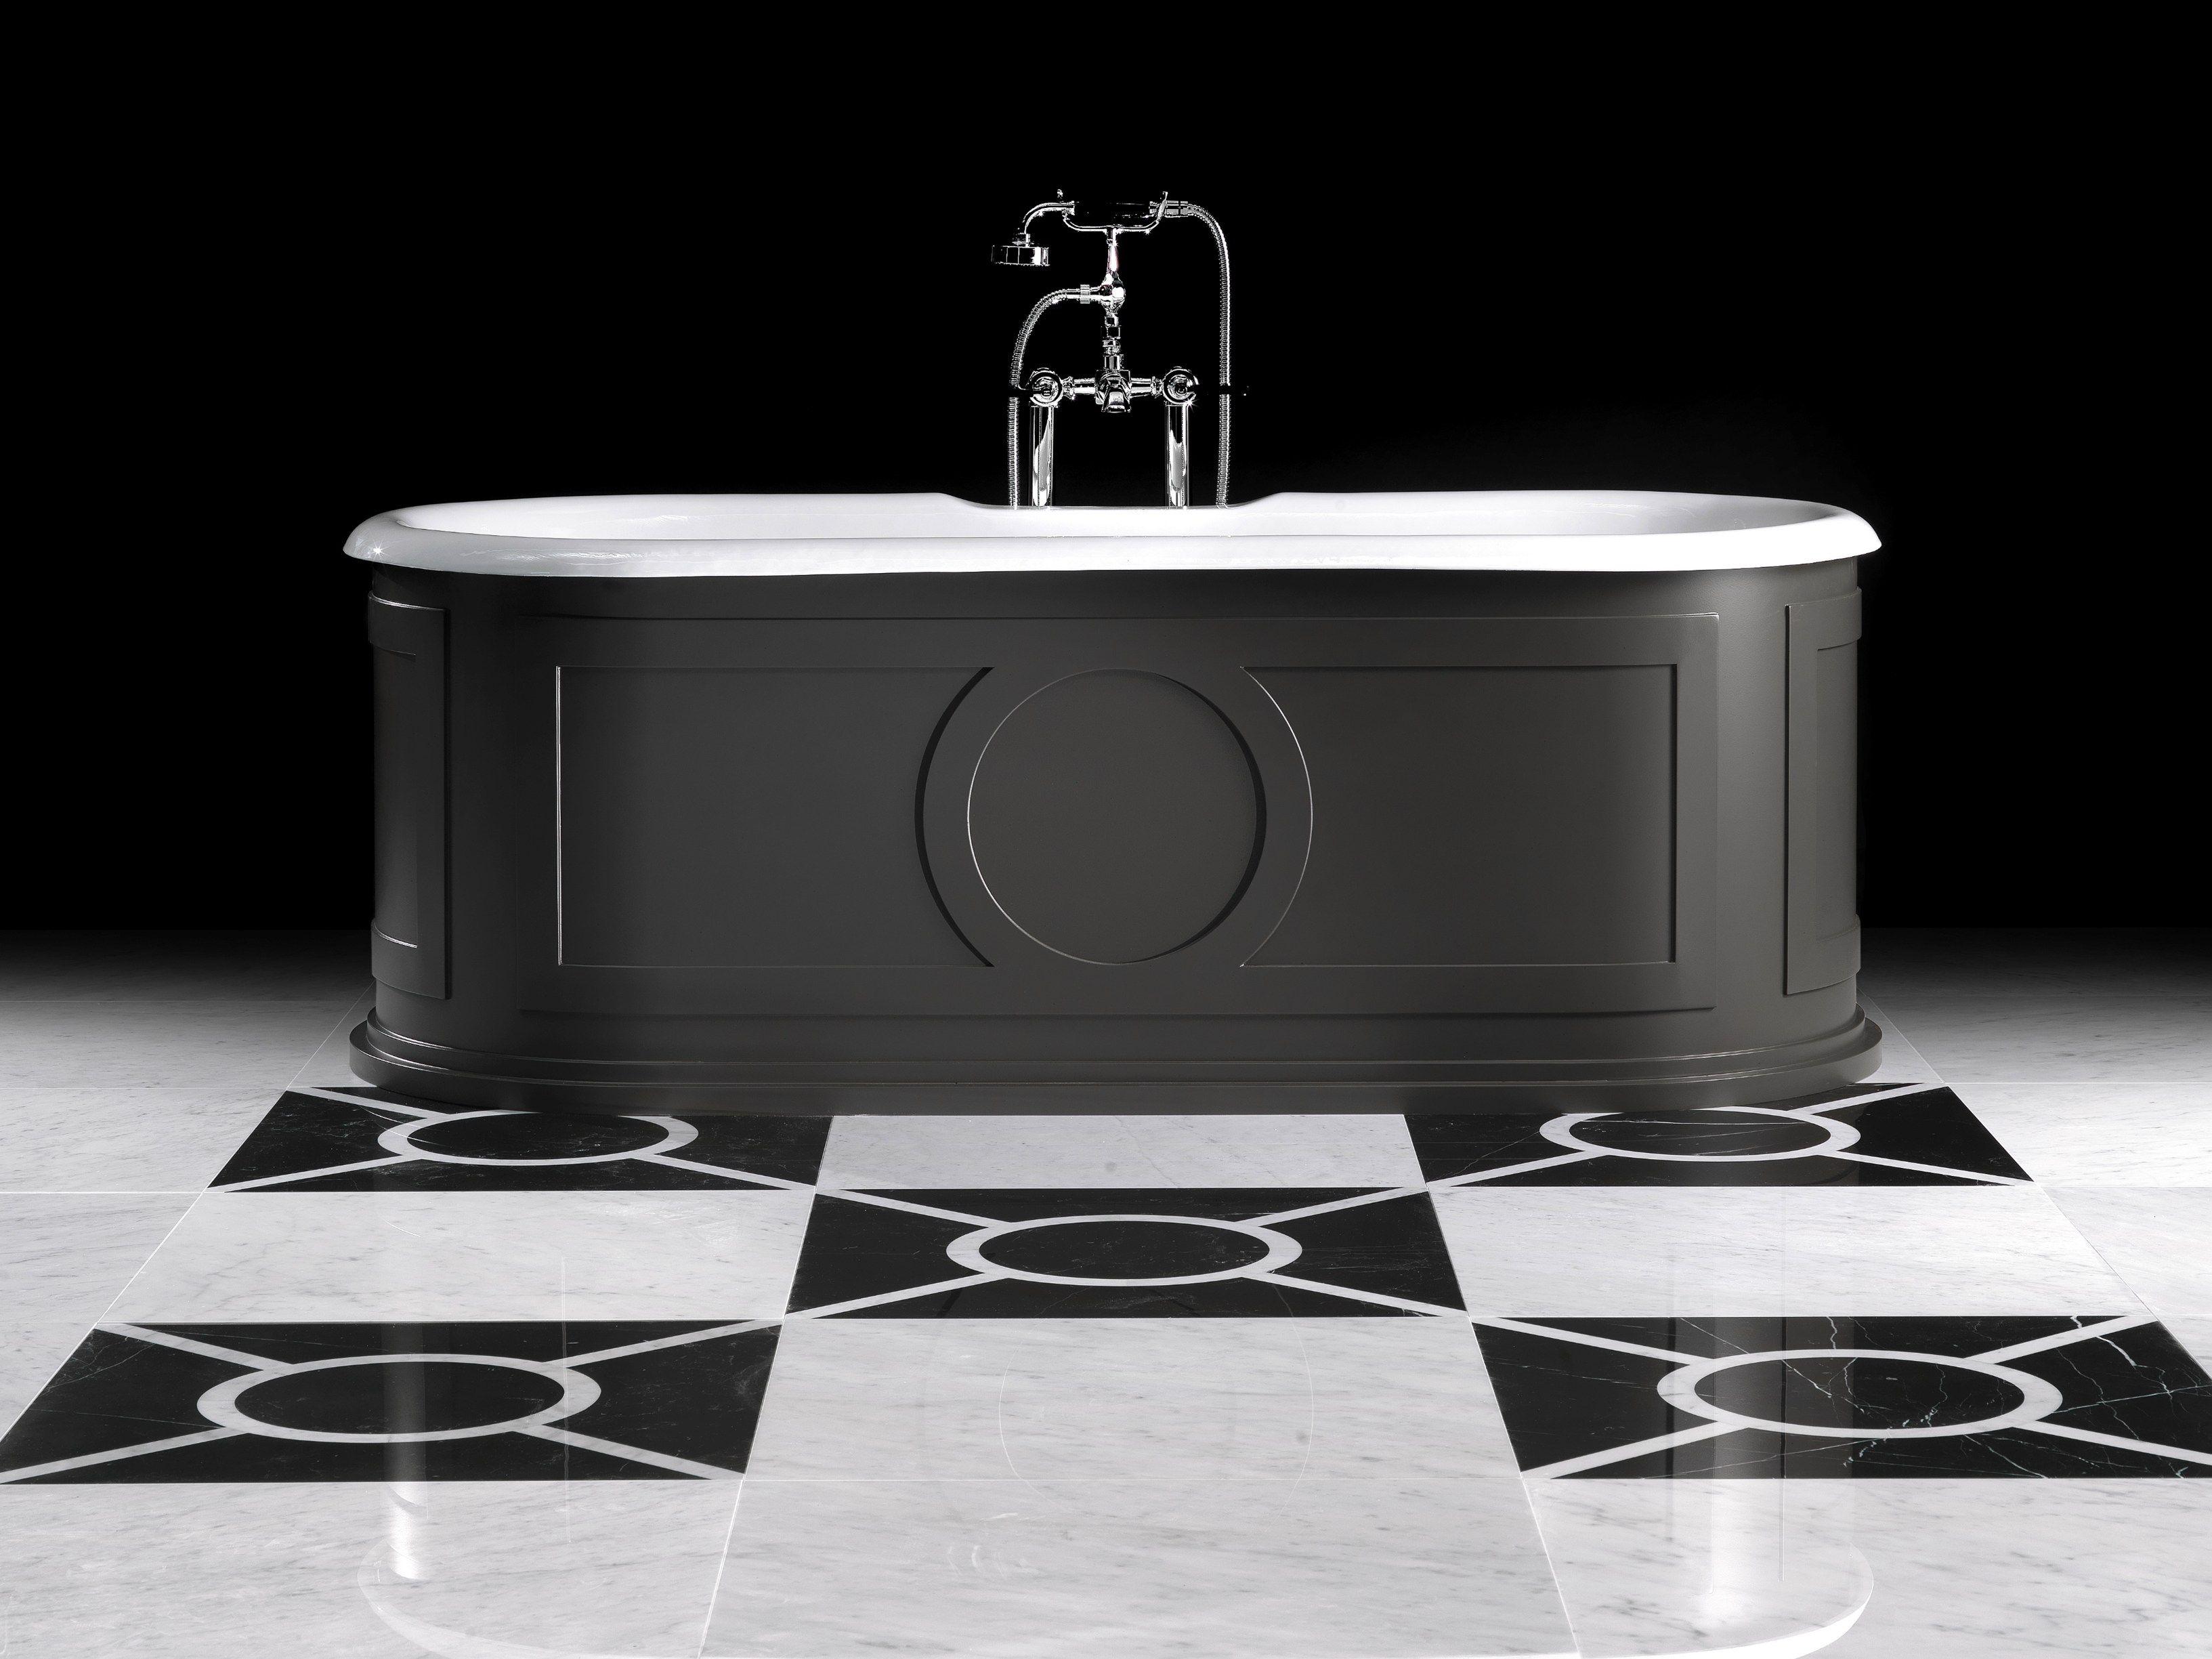 Vasca Da Bagno Karen : Vasca da bagno karen vasca da bagno classica prezzi azlit.net